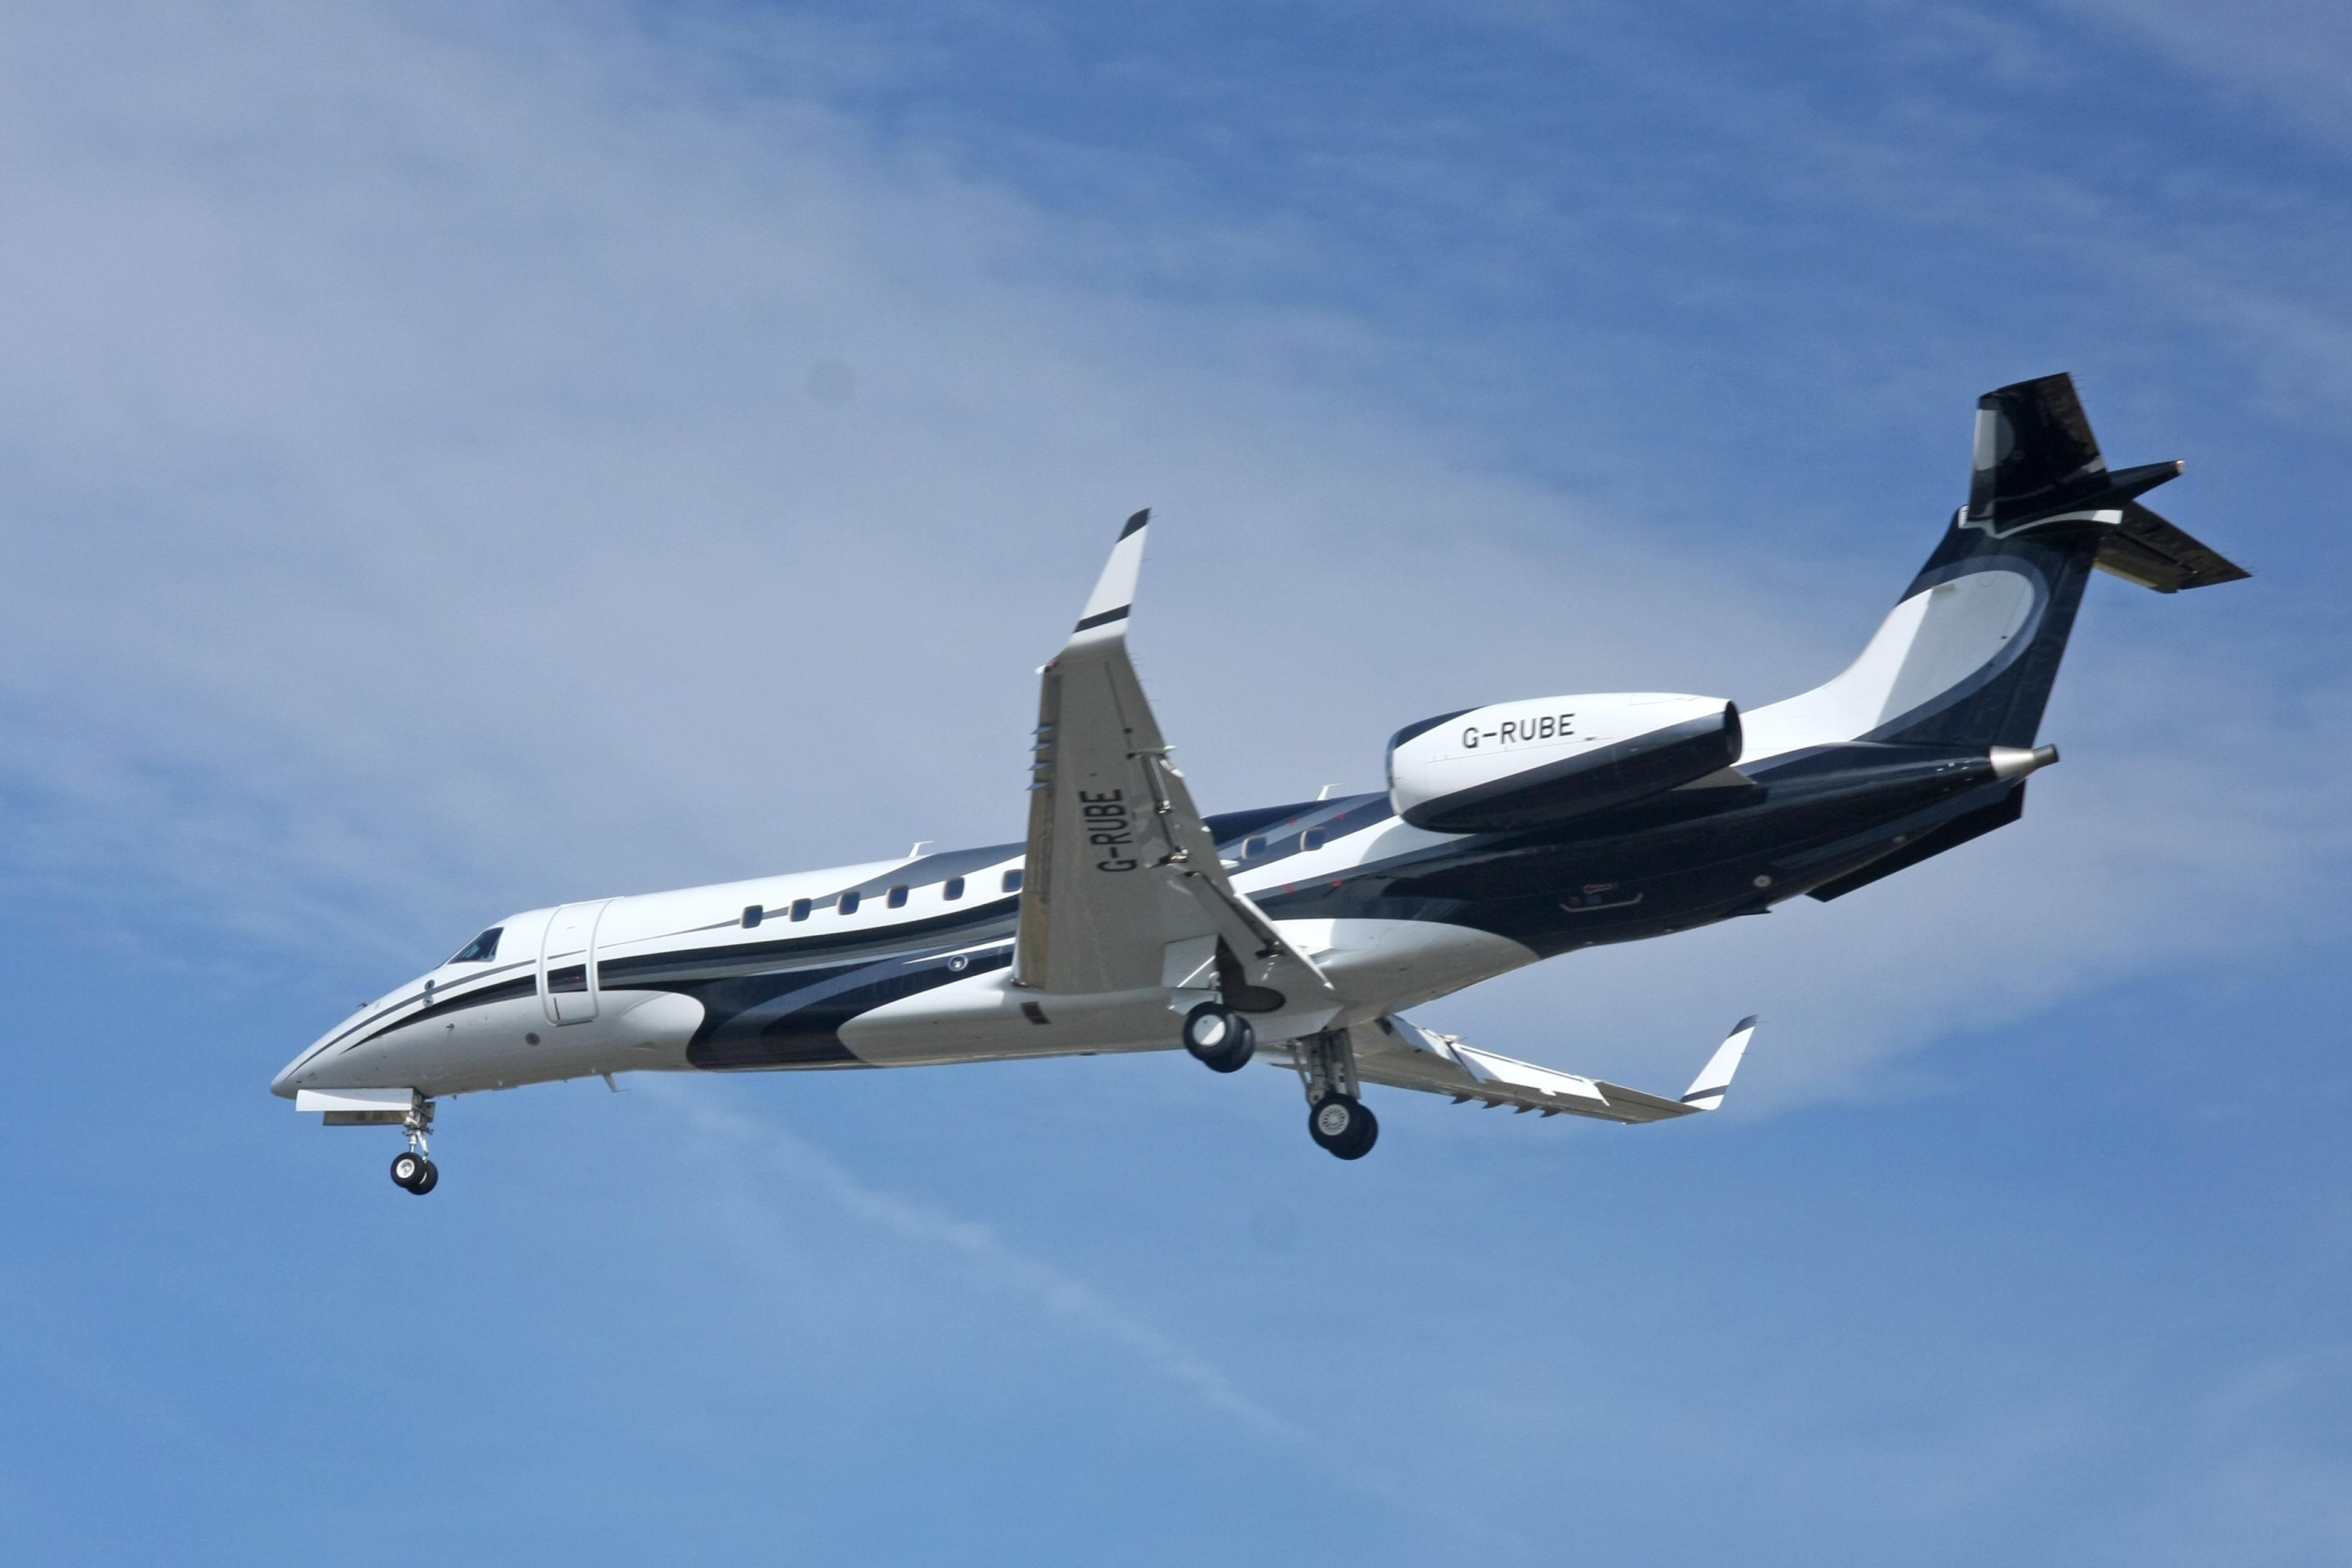 Embraer Legacy 600 Flight Manual 22794 Wiring Diagram Hunter File 4826812547 Wikimedia Commons Rh Org